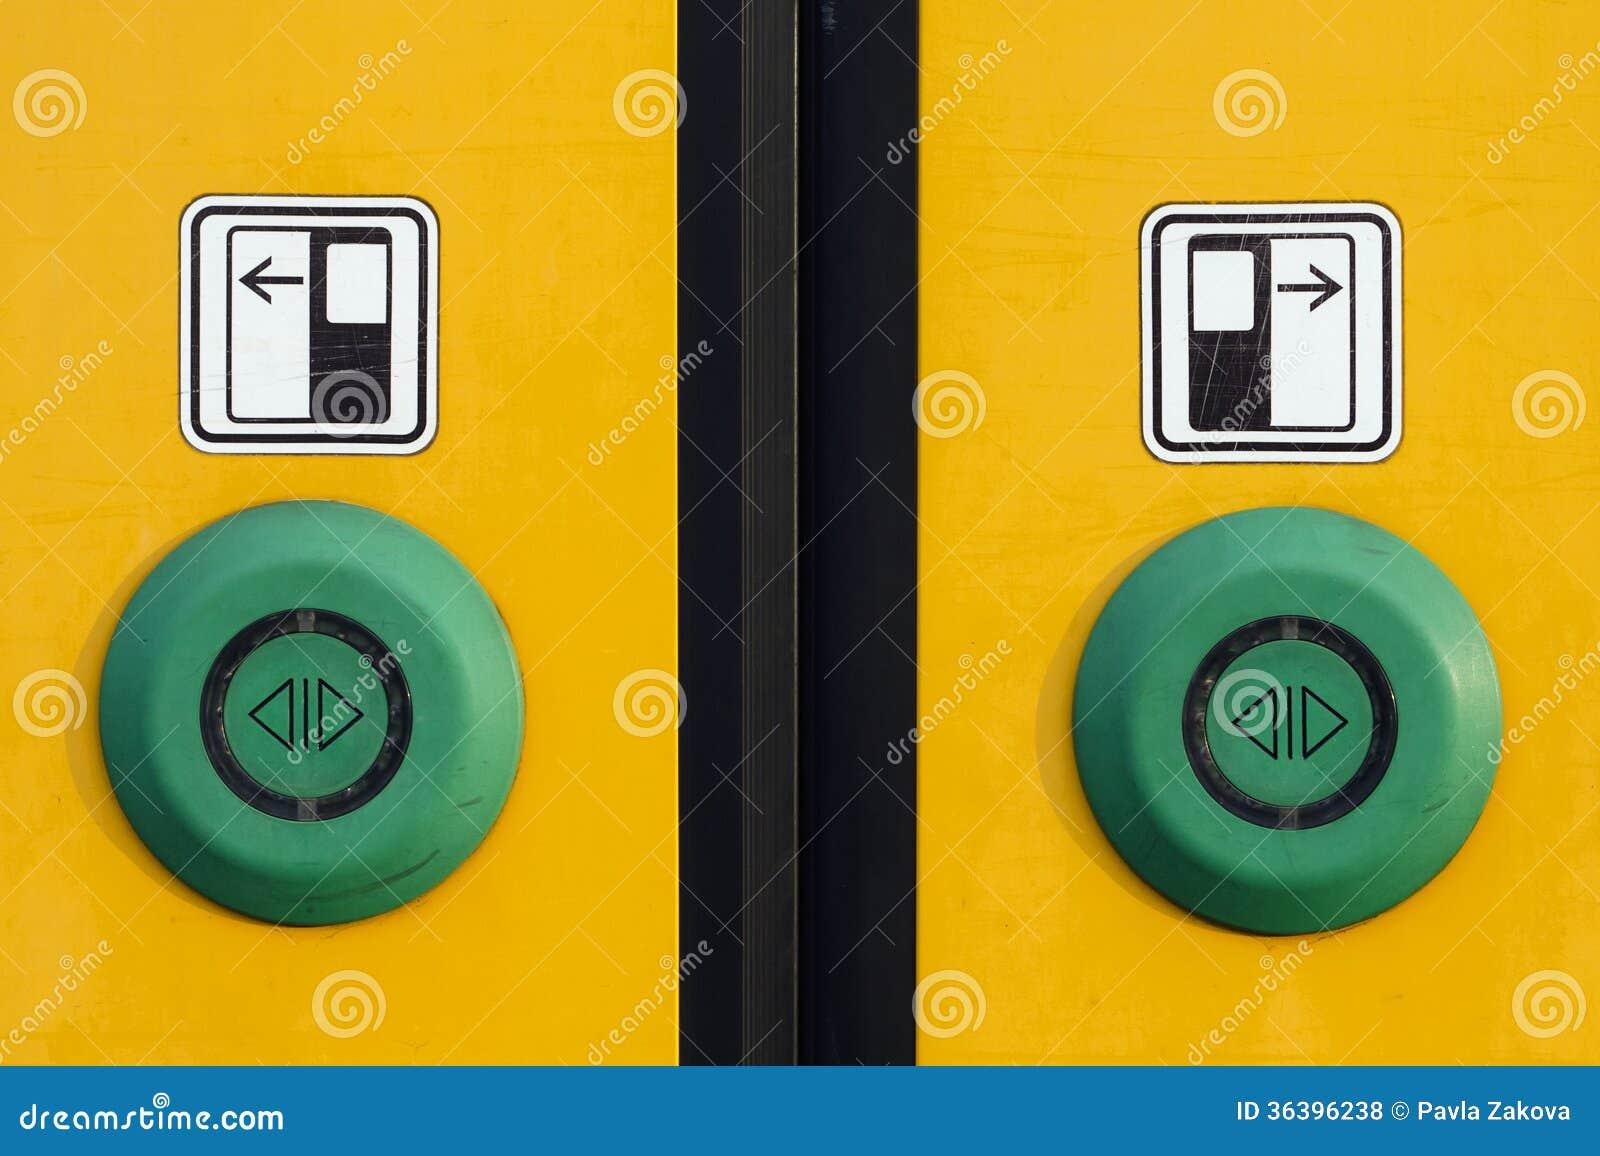 buttons door ... & Train Door Buttons Royalty Free Stock Photos - Image: 36396238 Pezcame.Com